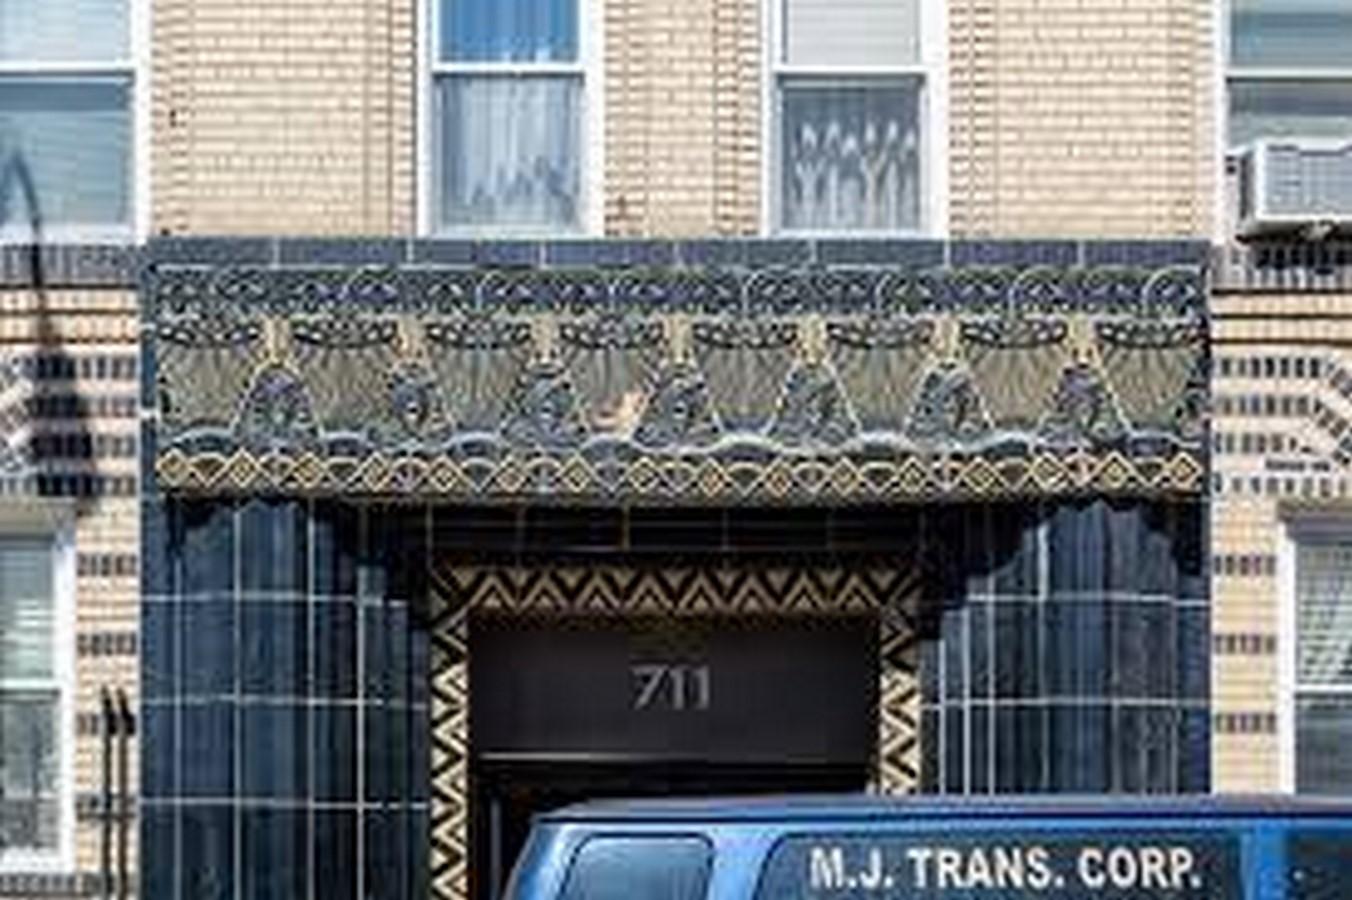 711 Brightwater Court - Brooklyn, New York - Sheet3